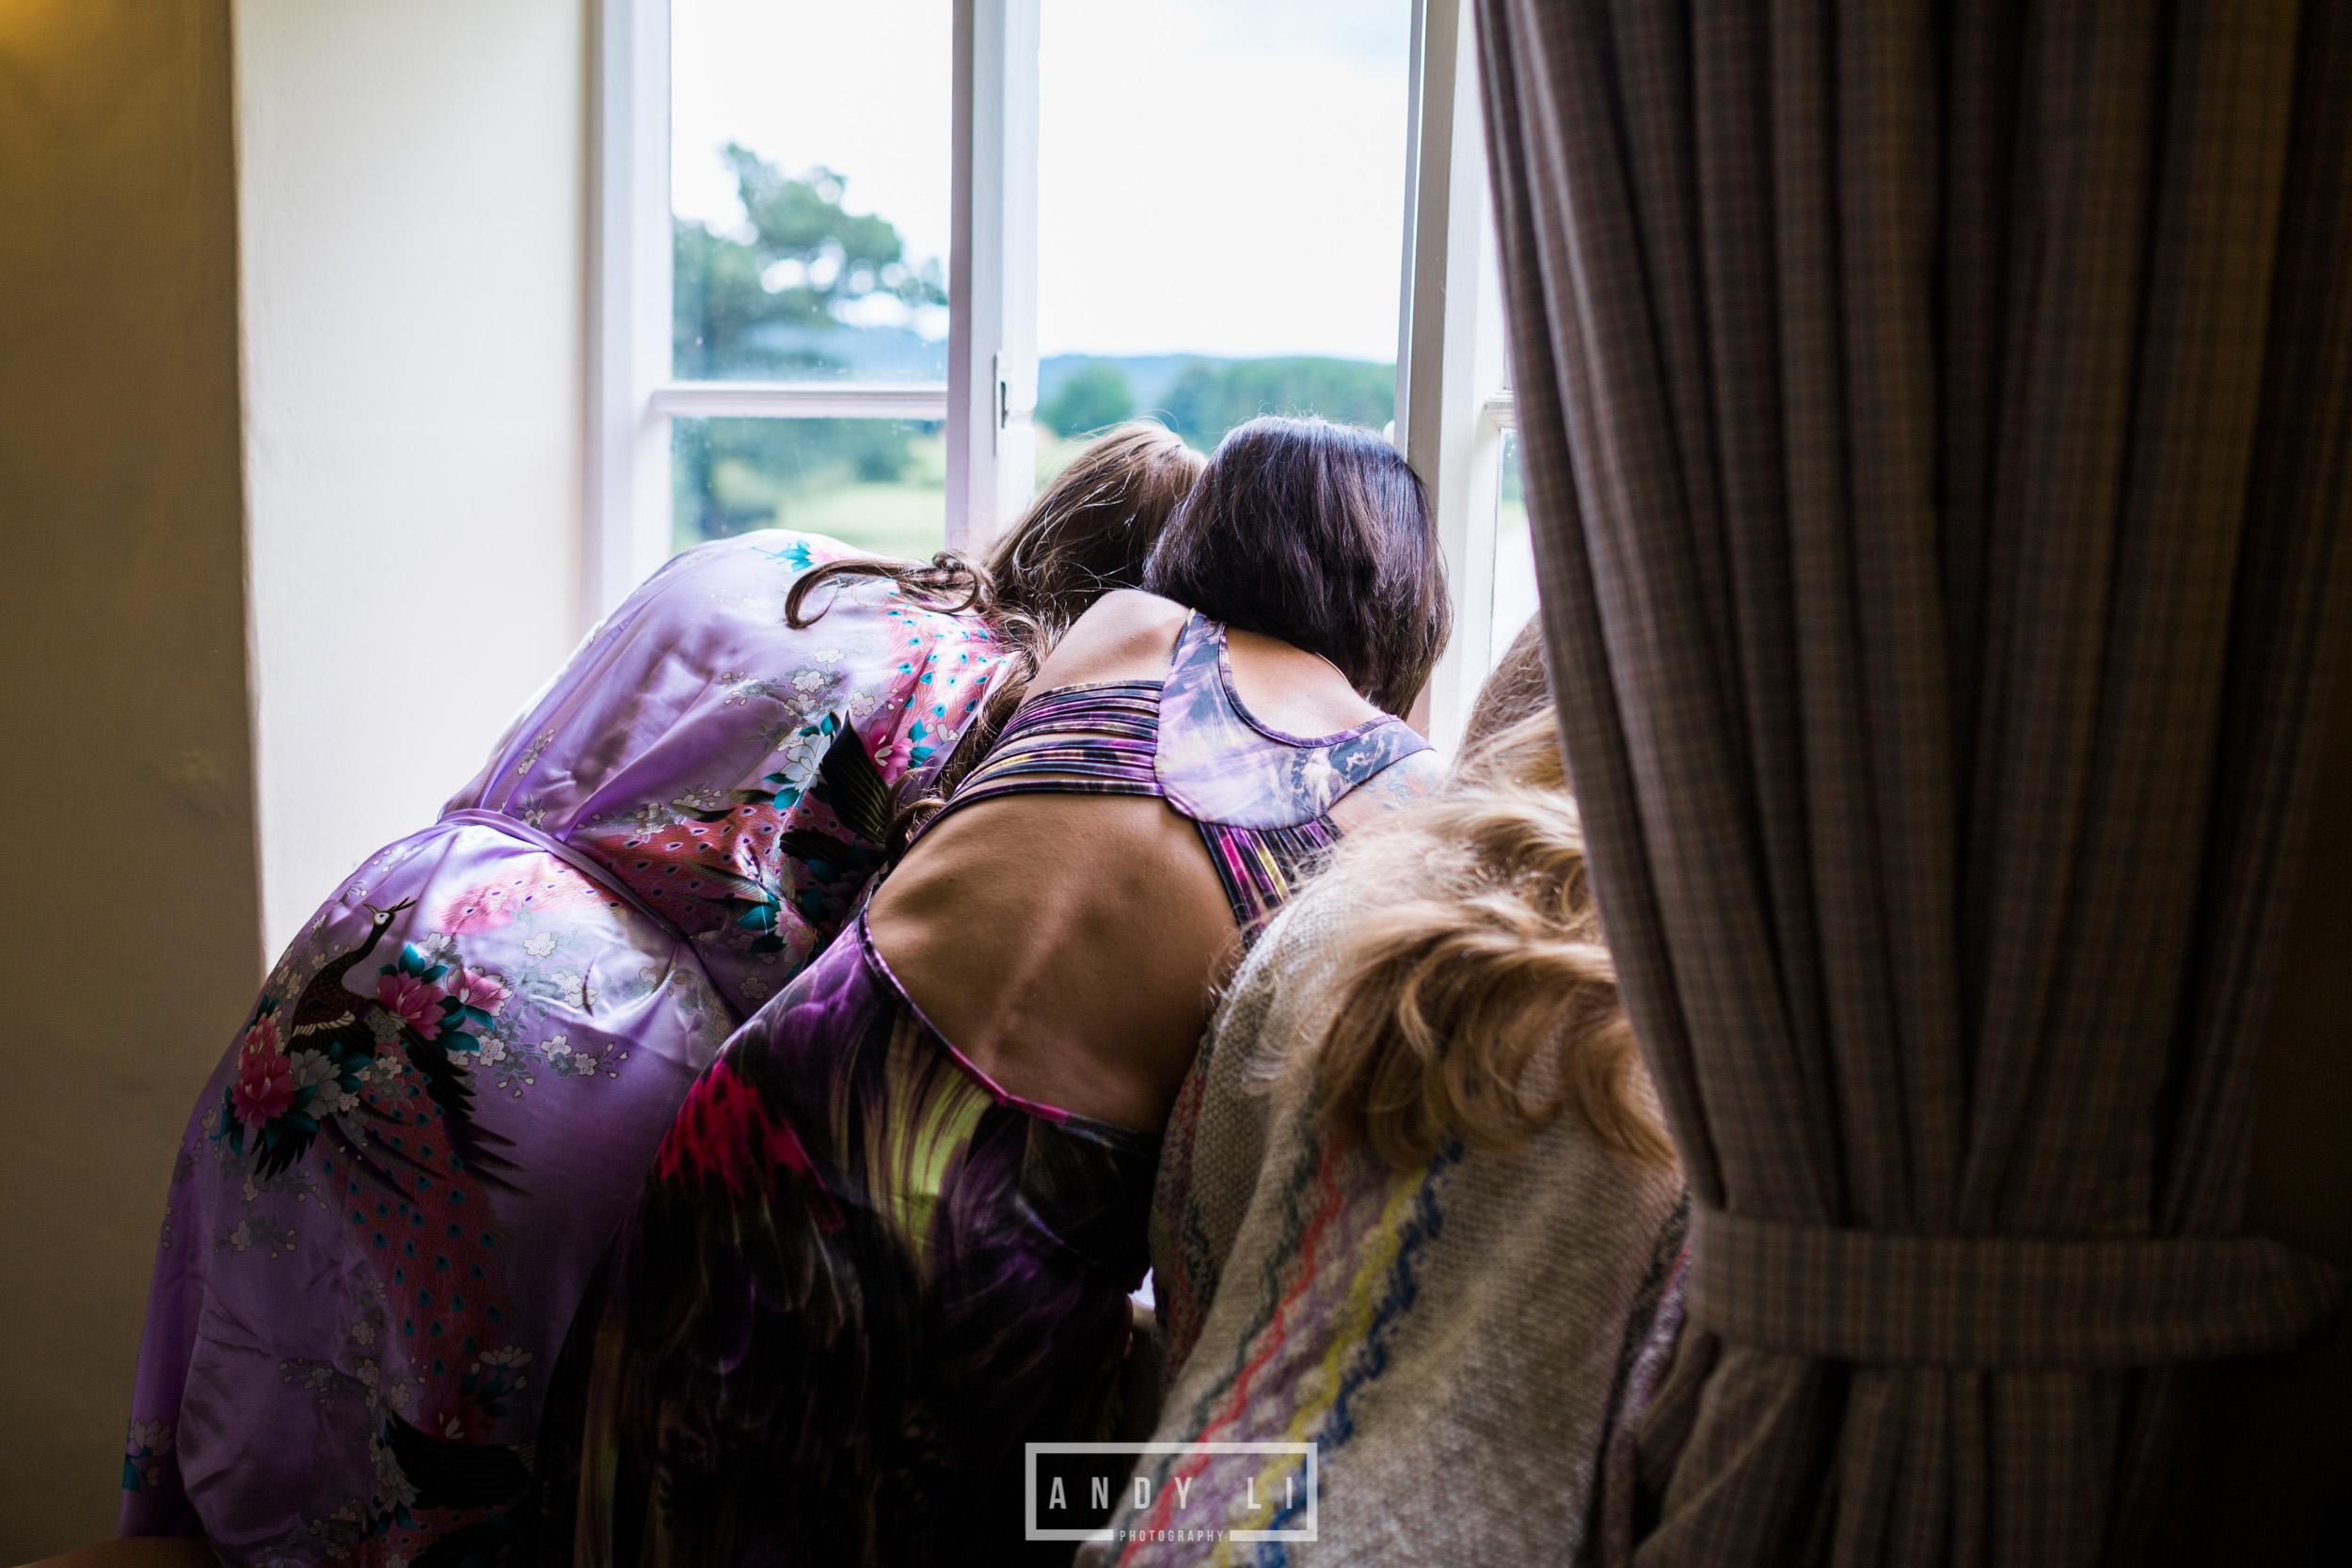 Festival Wedding Shropshire-Andy Li Photography-062.jpg